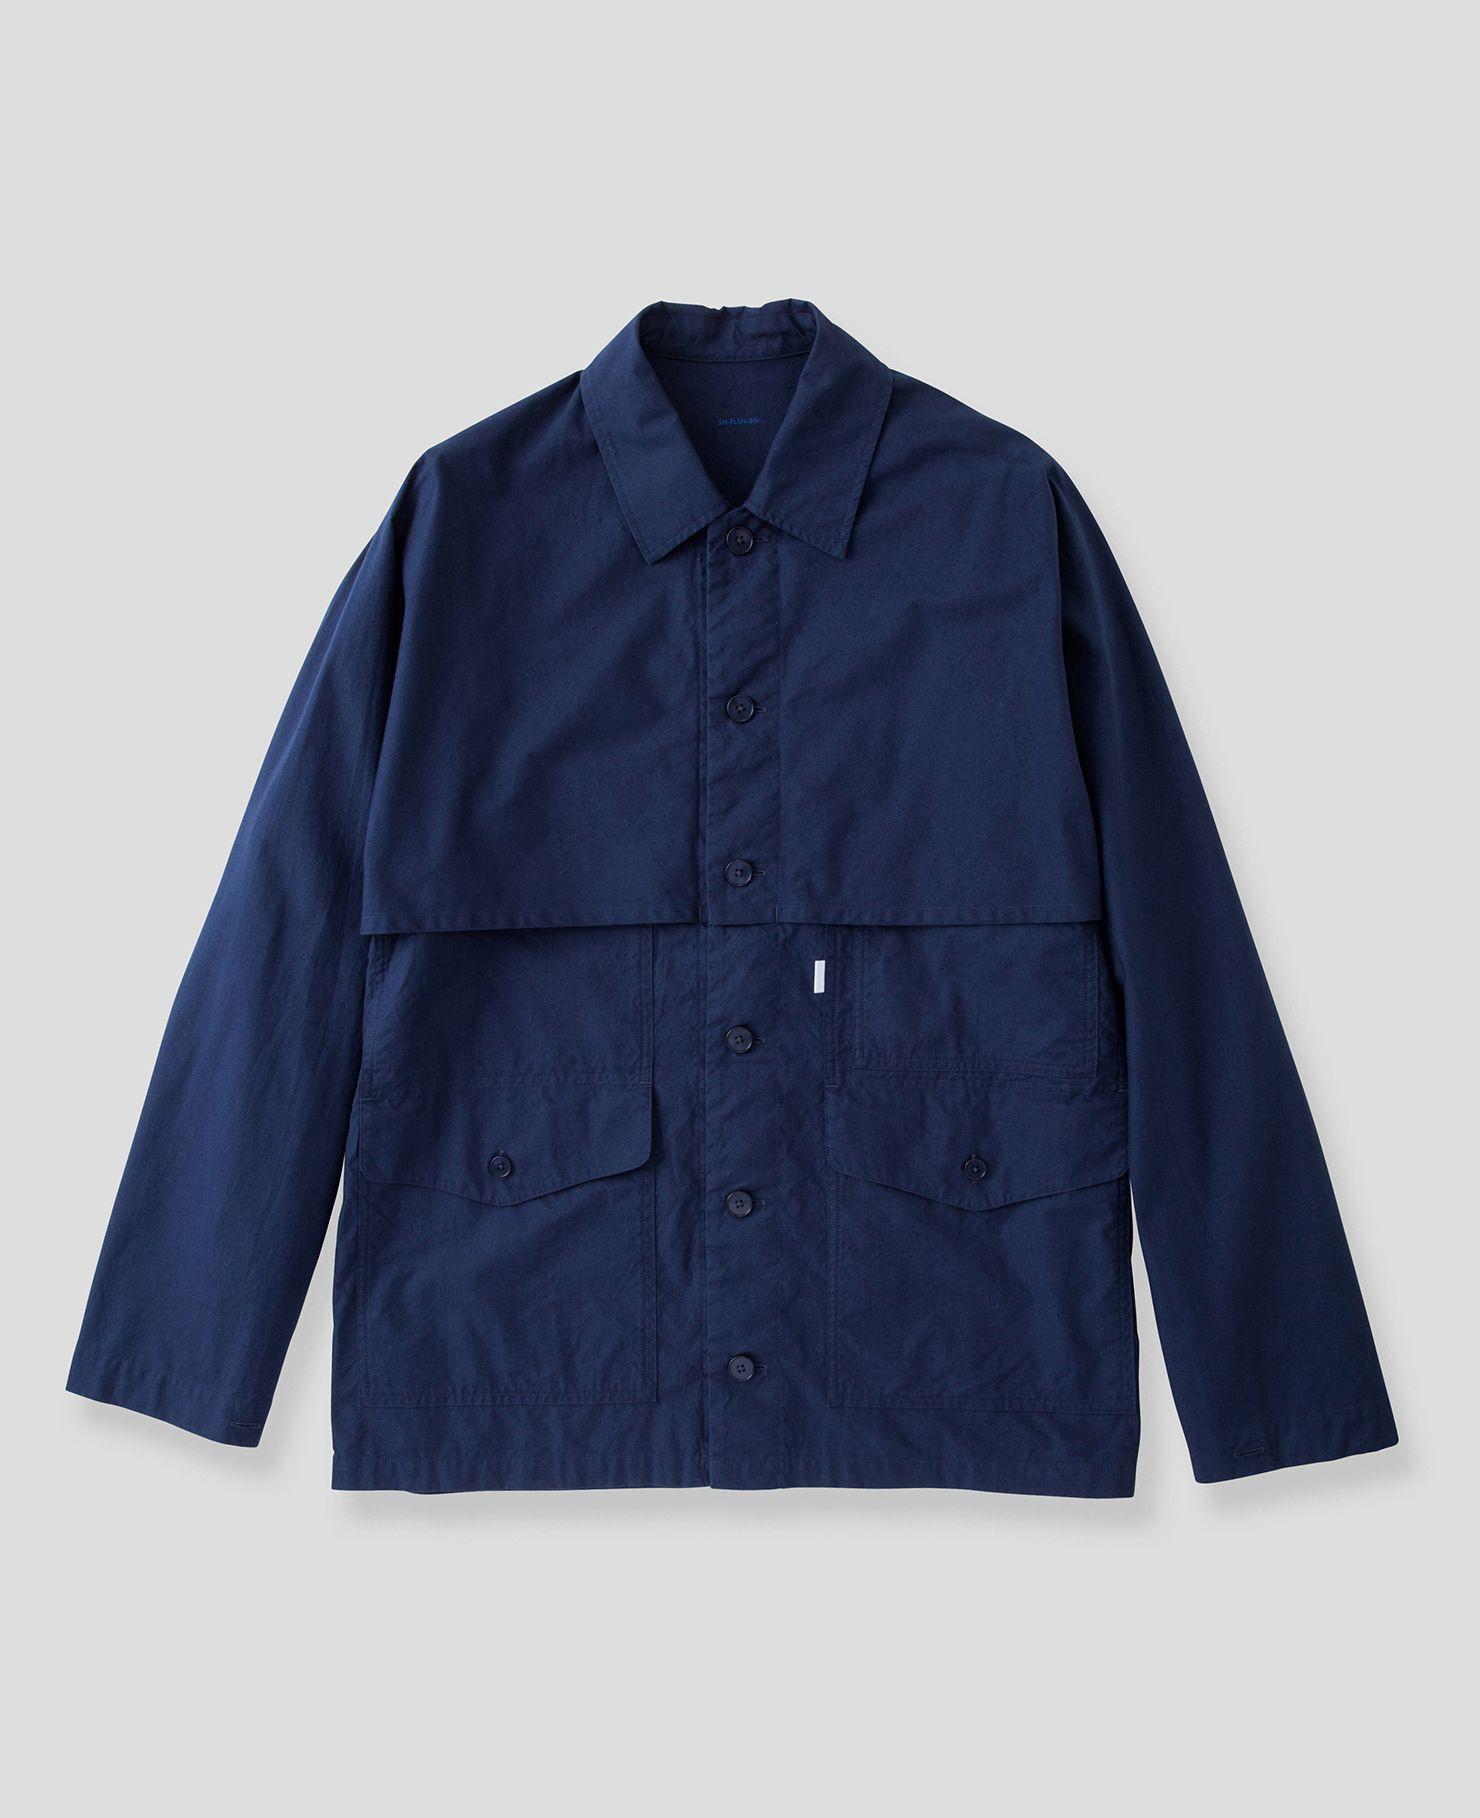 3c466c79f54 IHM-15 - Khaki Alpaca Lined Whipcord N1 Deck Half-Coat